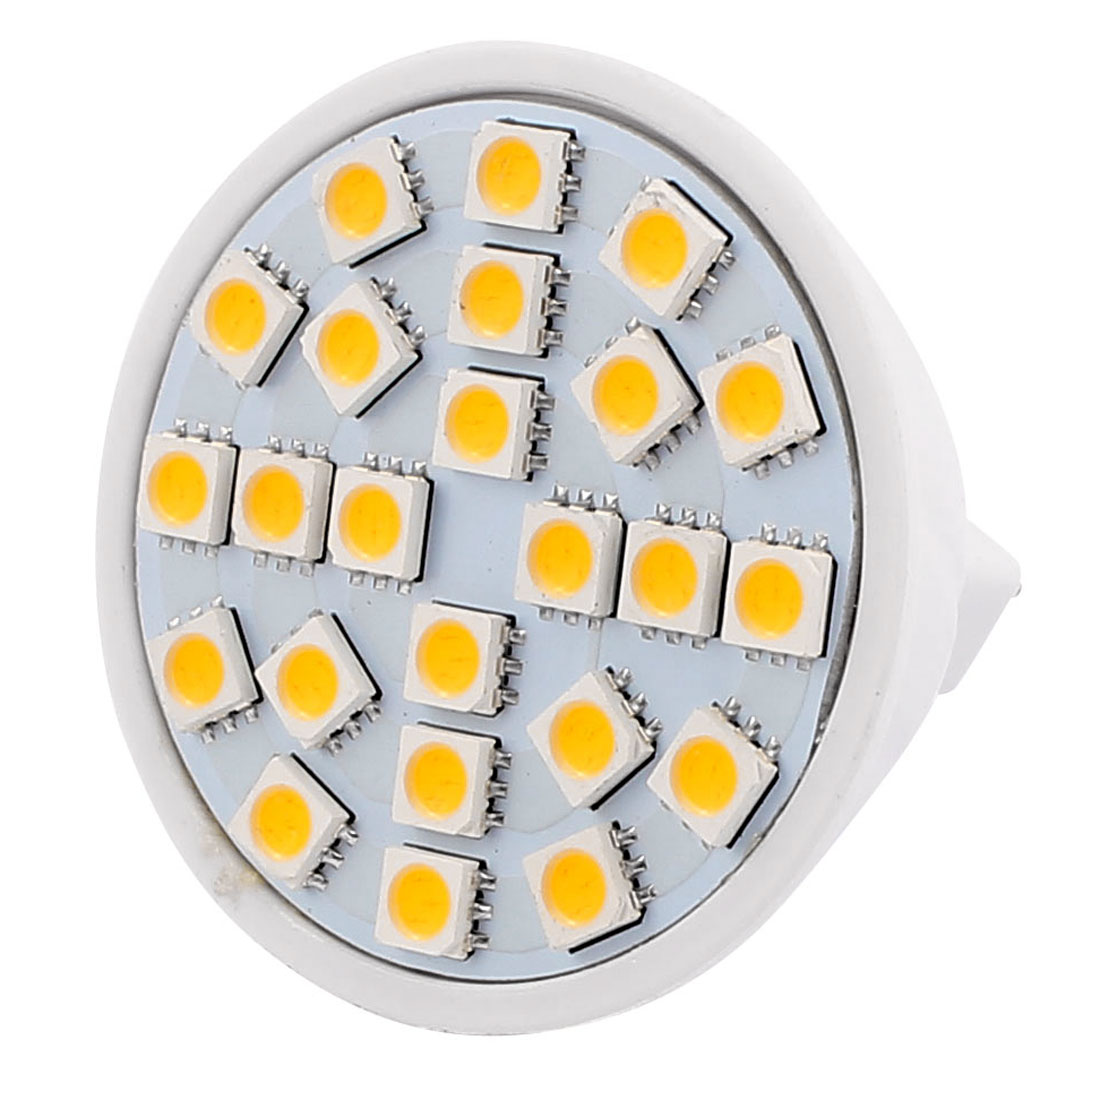 MR16 AC 220V 3W SMD 5050 24 LEDs Plastic Energy Saving LED Lamp Bulb Warm White